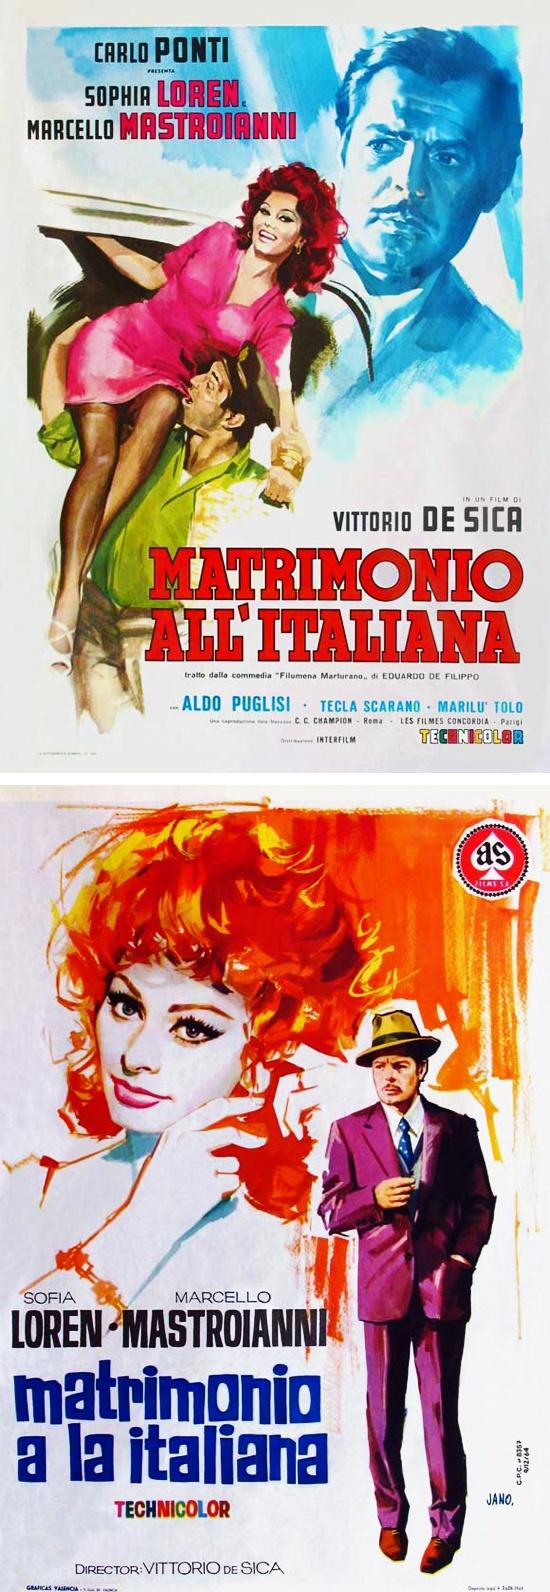 Promotional Posters for 'Matrimonio All' Italiana' (1964) (Marriage Italian Style) Sophia Loren with Marcello Mastroianni